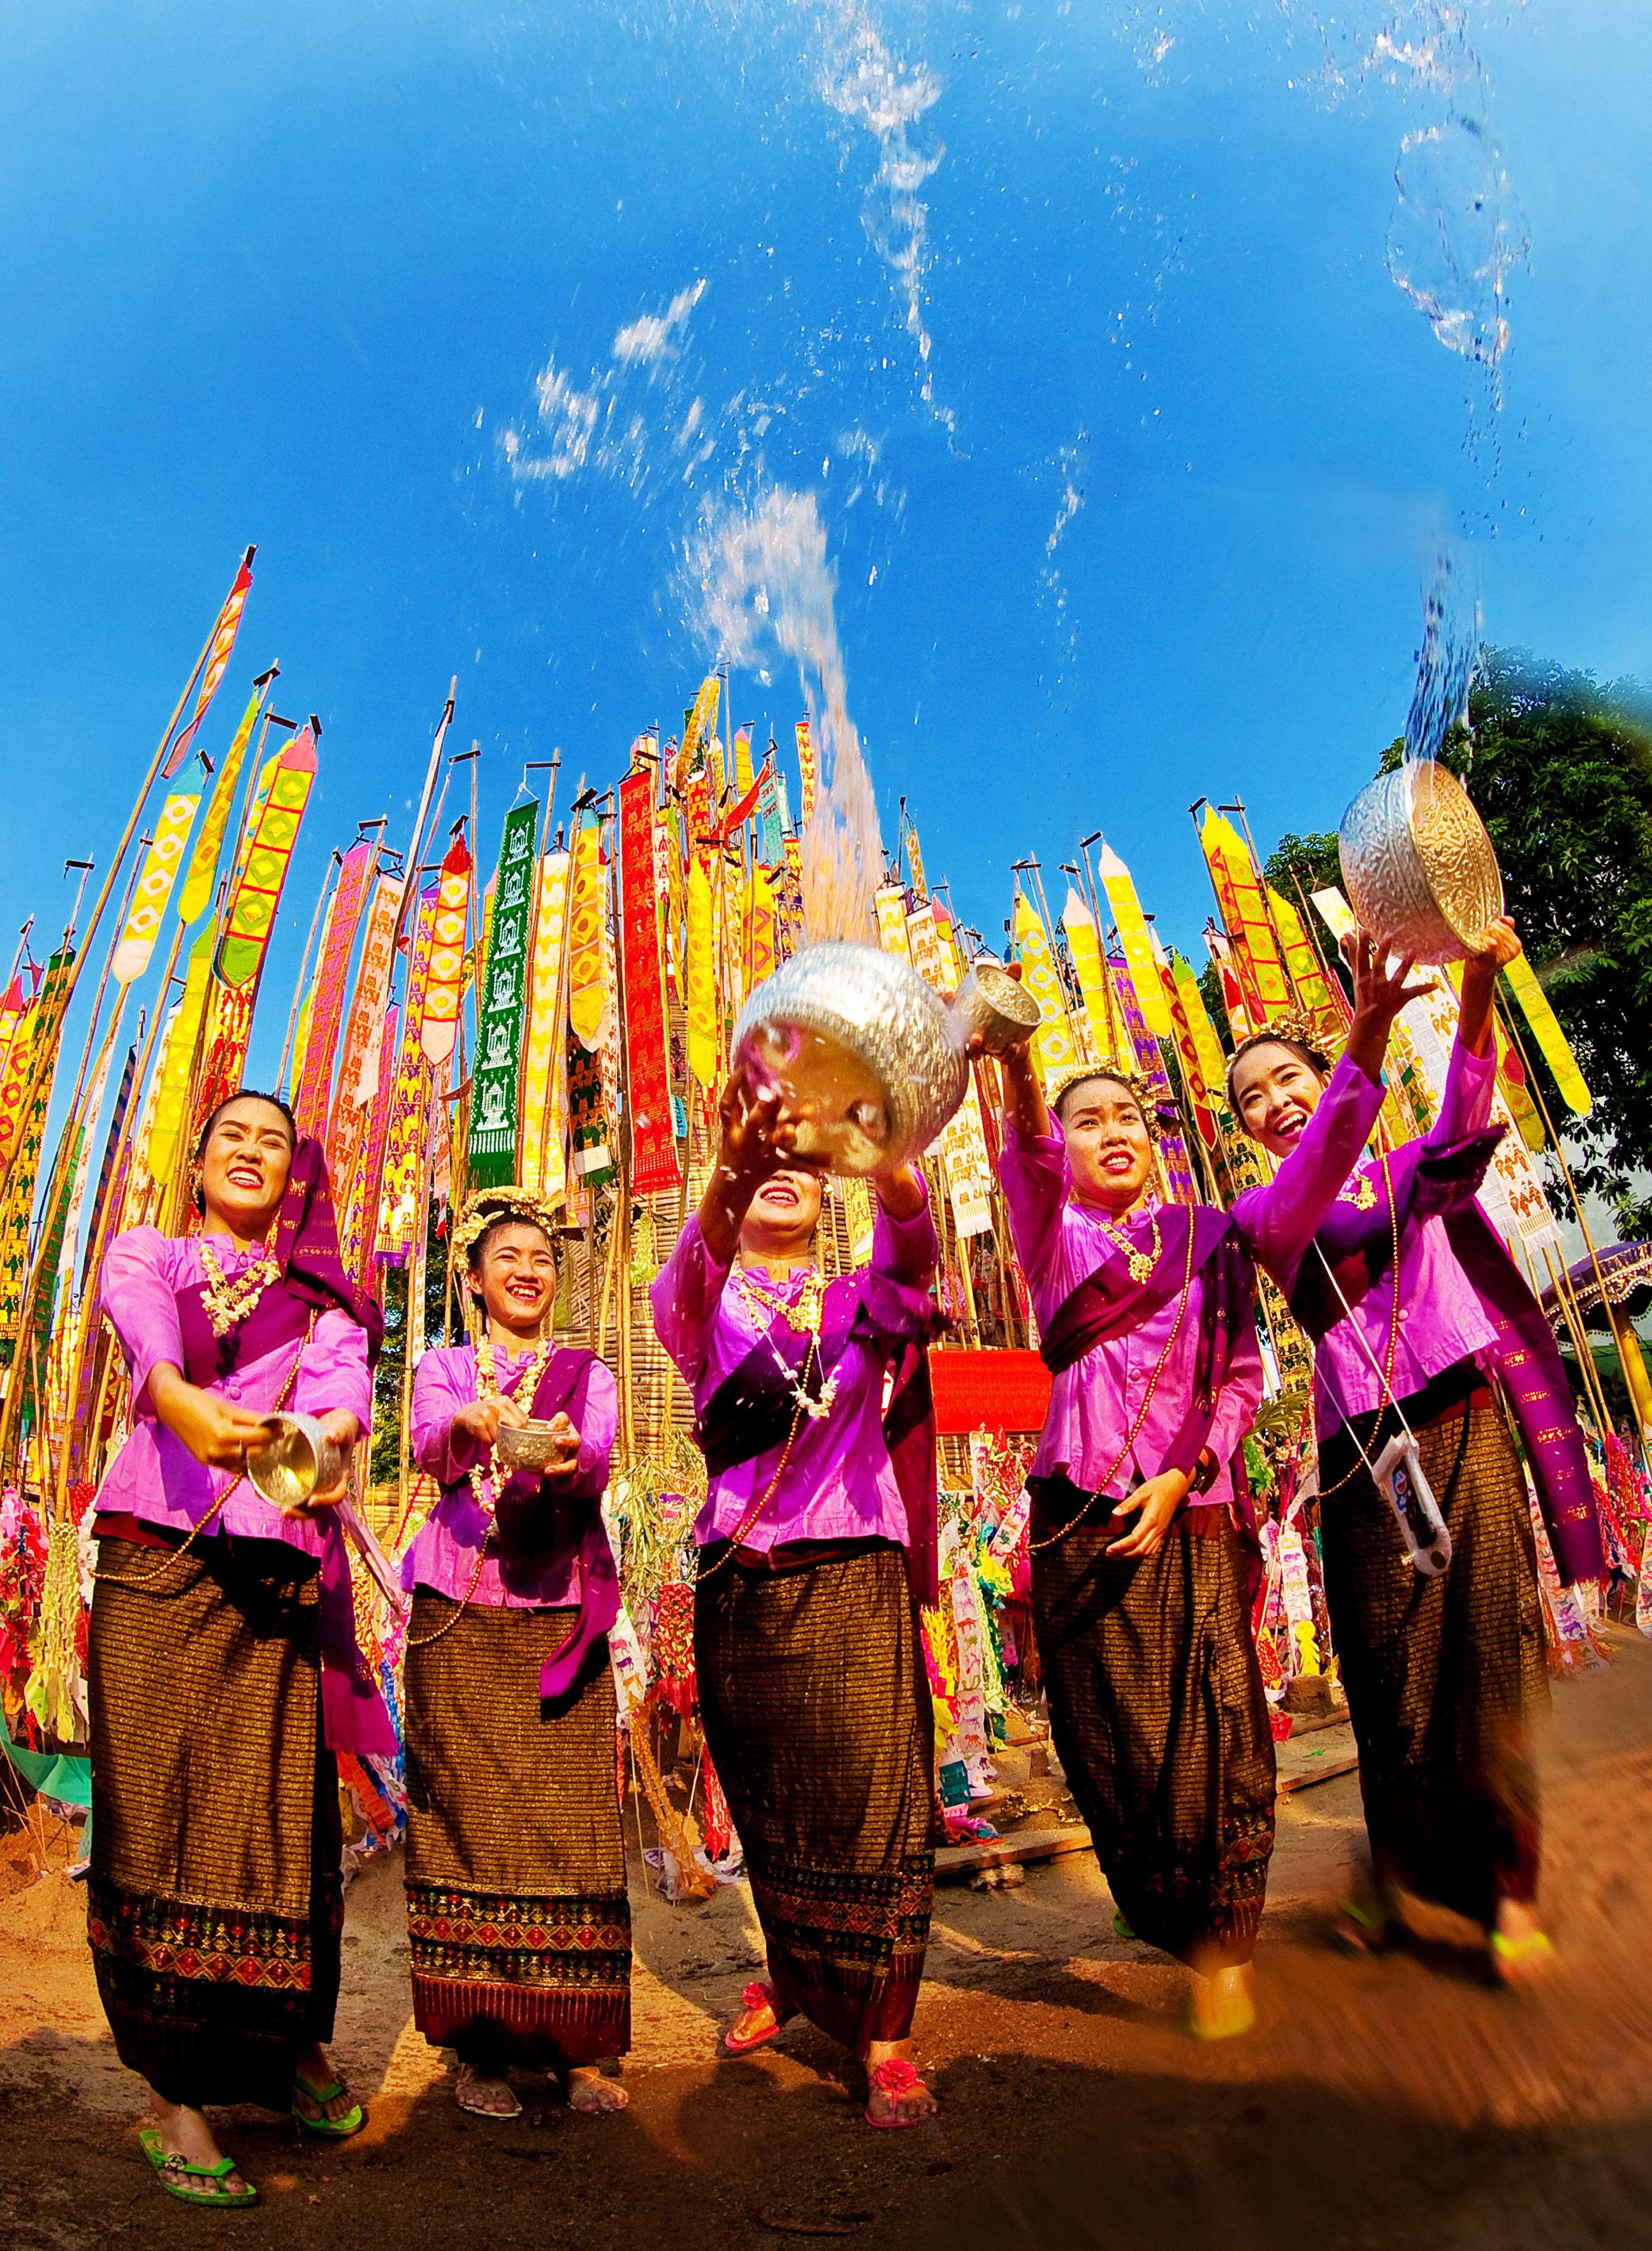 A Splashing New Year: The Songkran Festival   Thailand http://www.westernoriental.com/blog/splashing-new-year-songkran-festival-thailand/